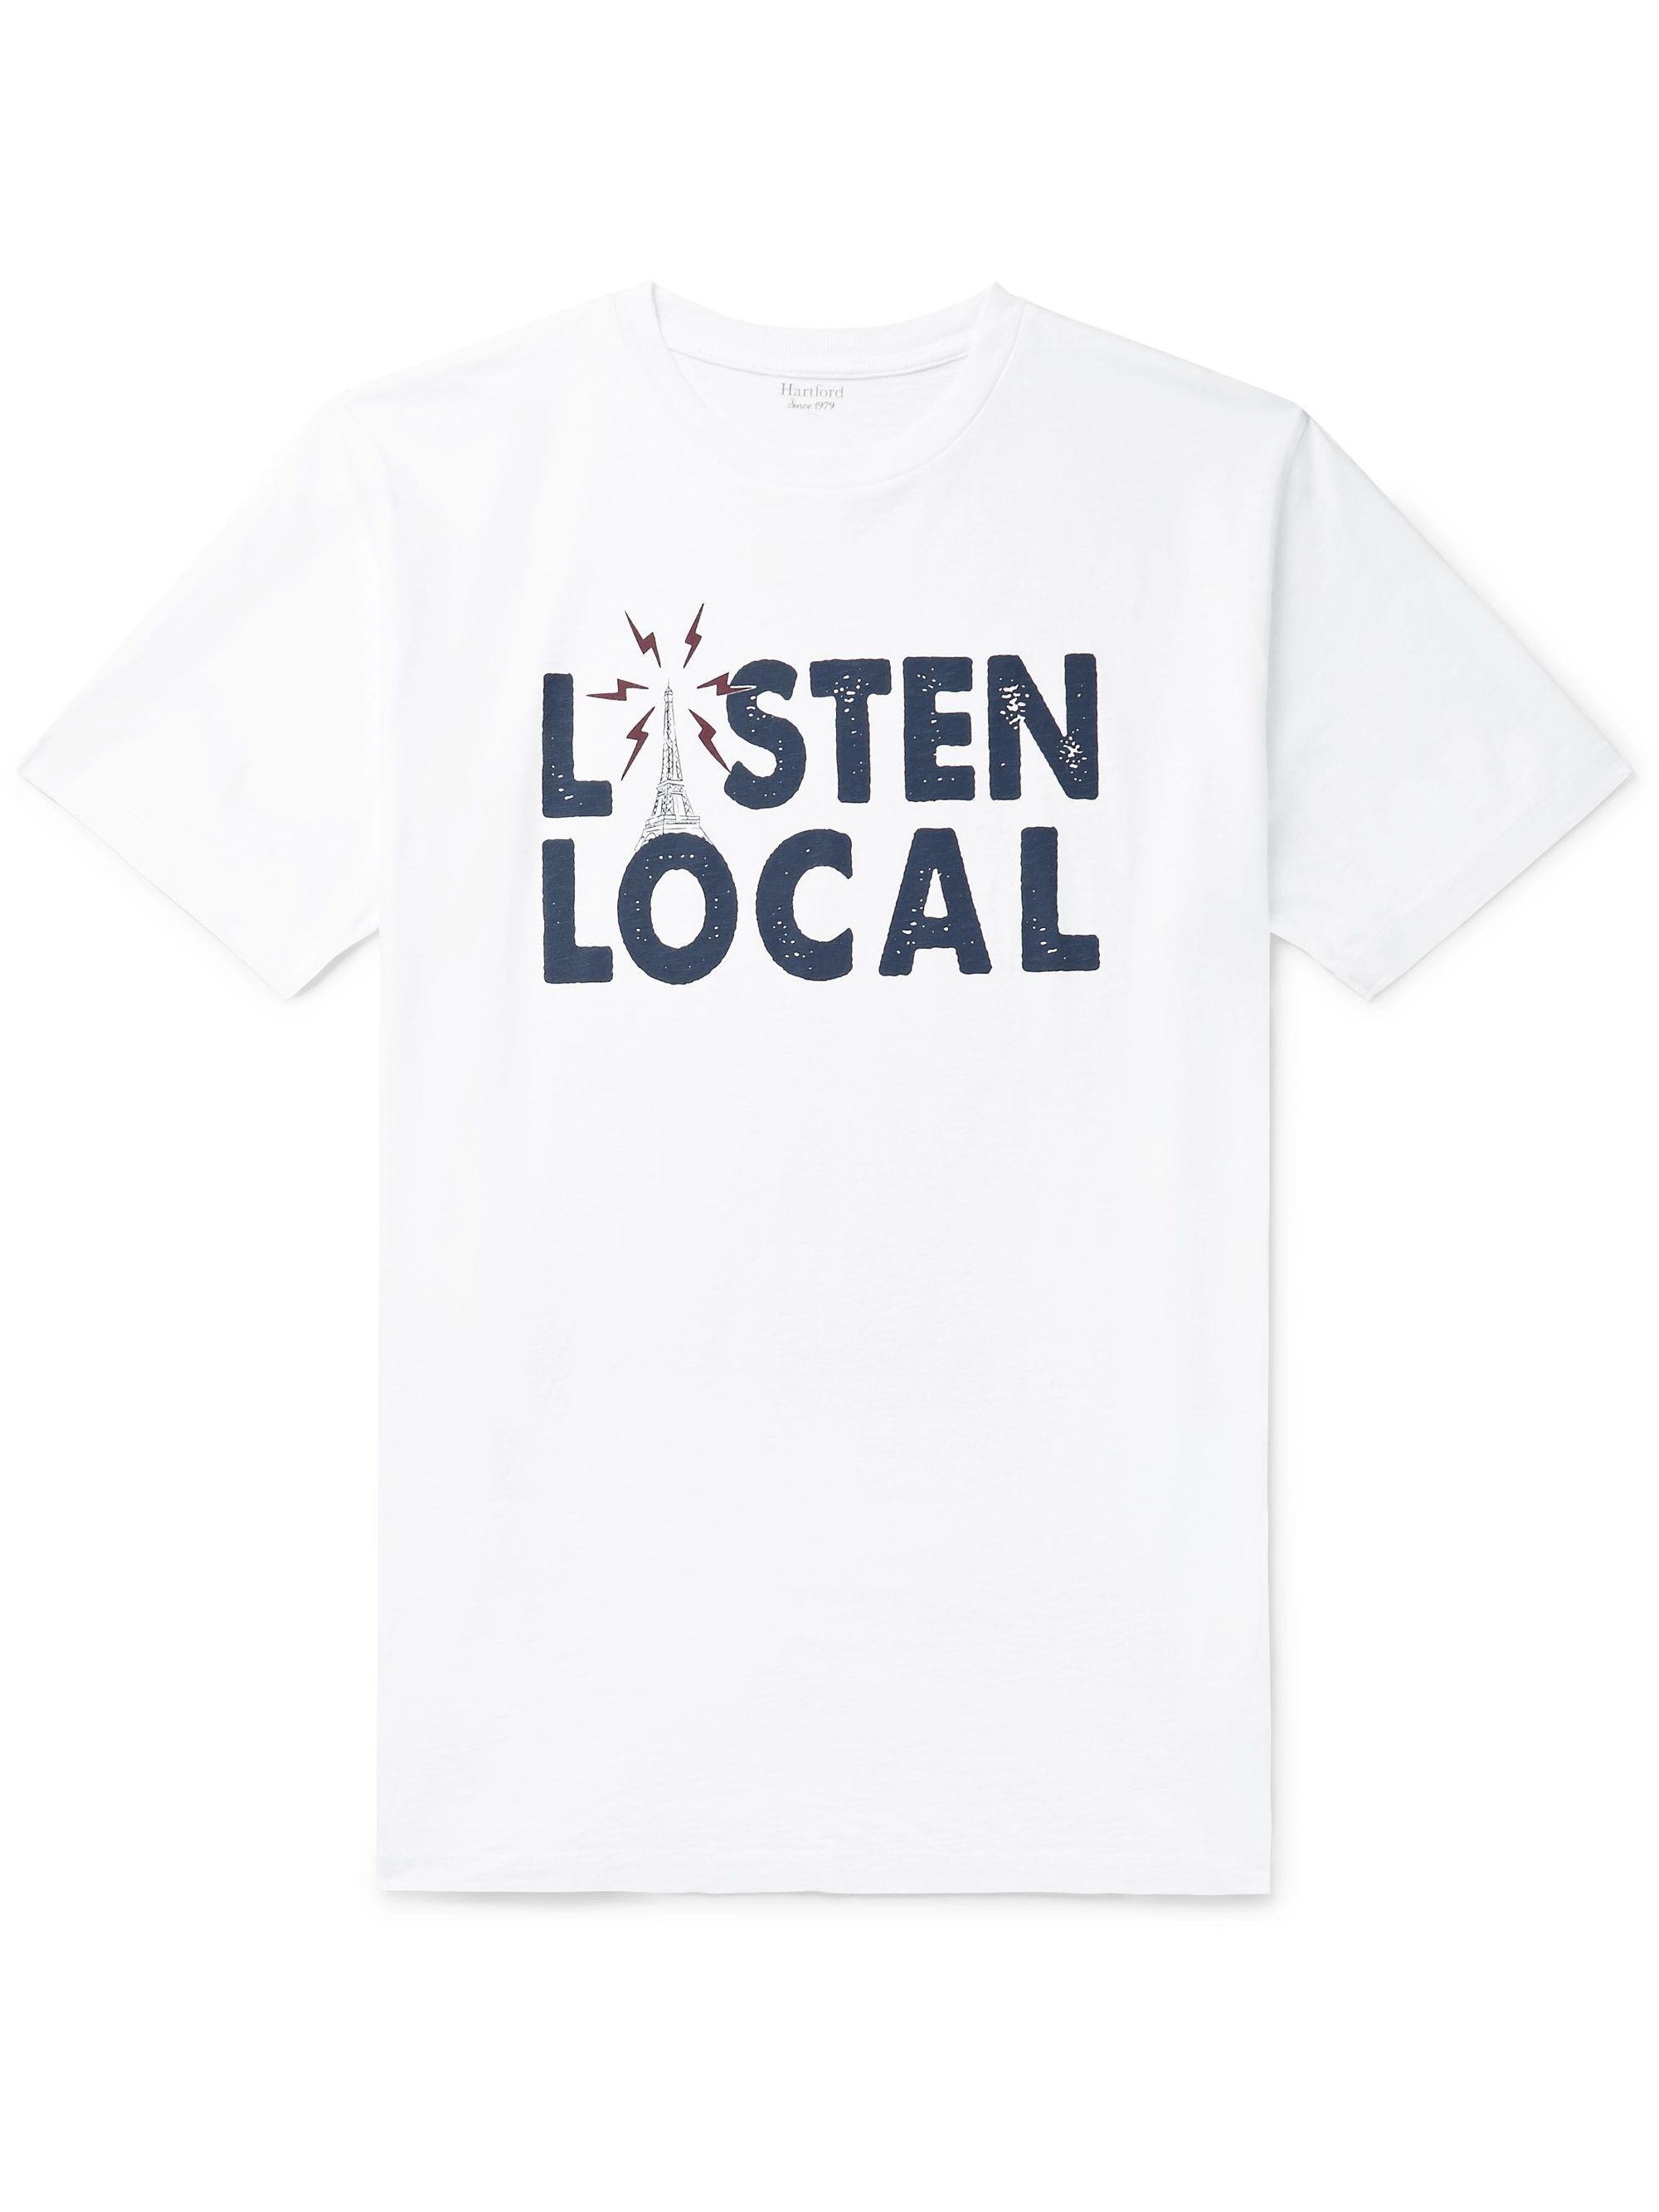 online retailer cc918 4ac95 Listen Local Printed Cotton-Jersey T-Shirt